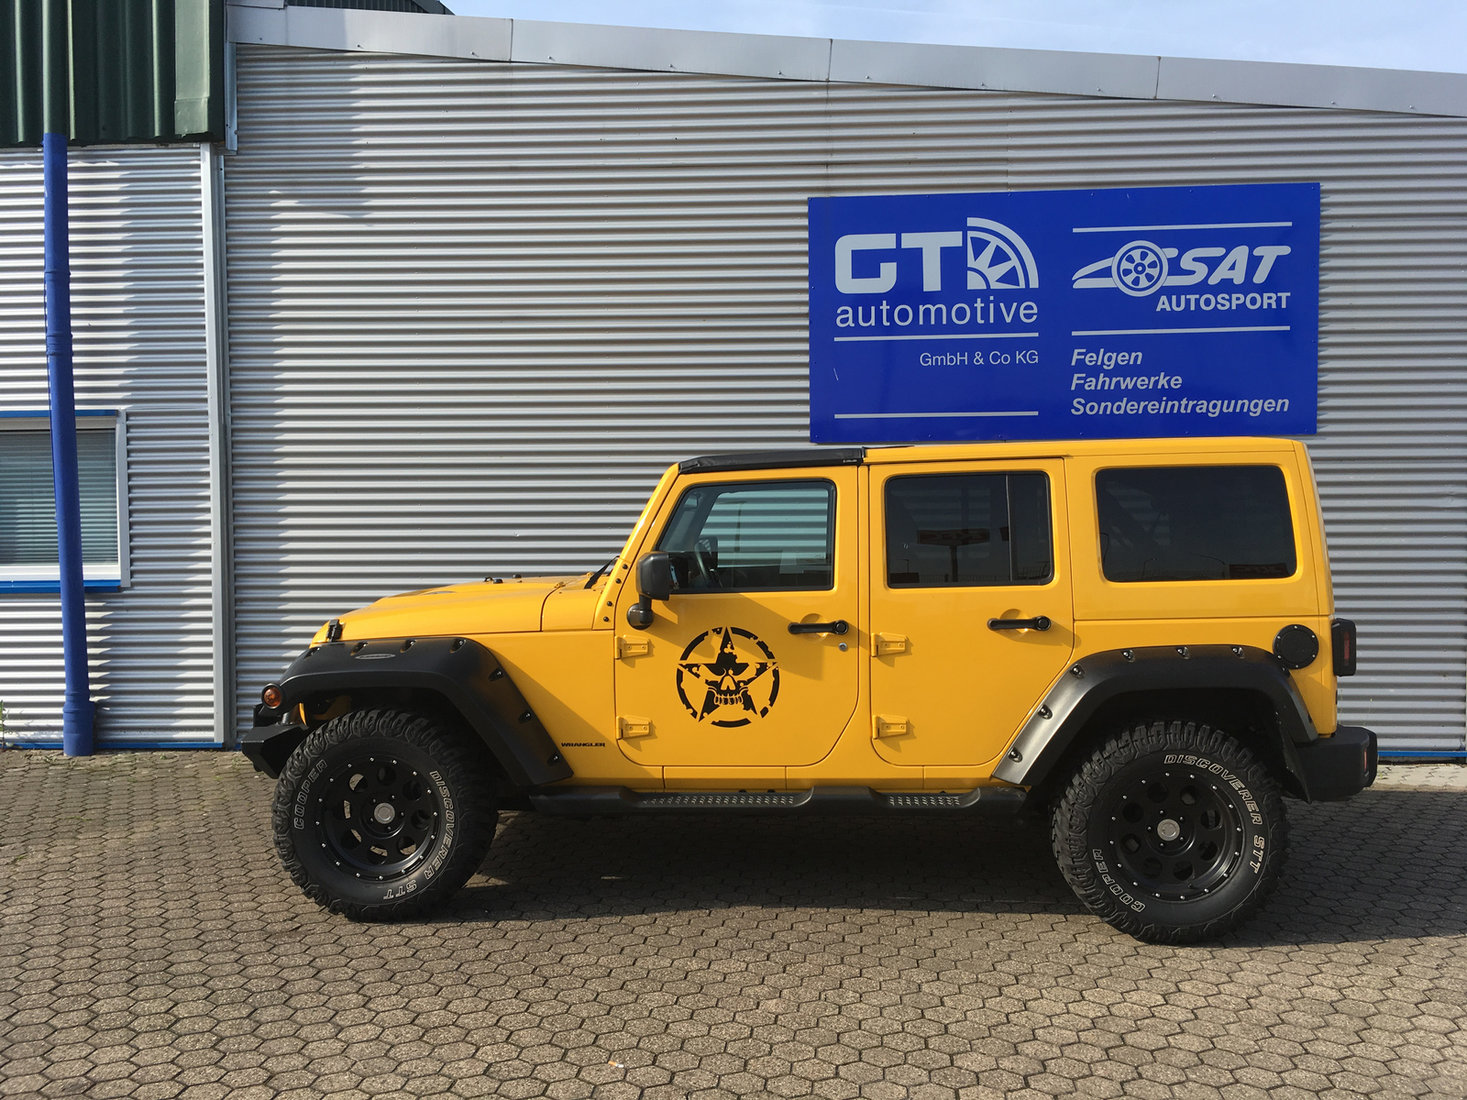 Jeep Wrangler Typ JK Galerie by GT-Automotive GmbH & Co  KG